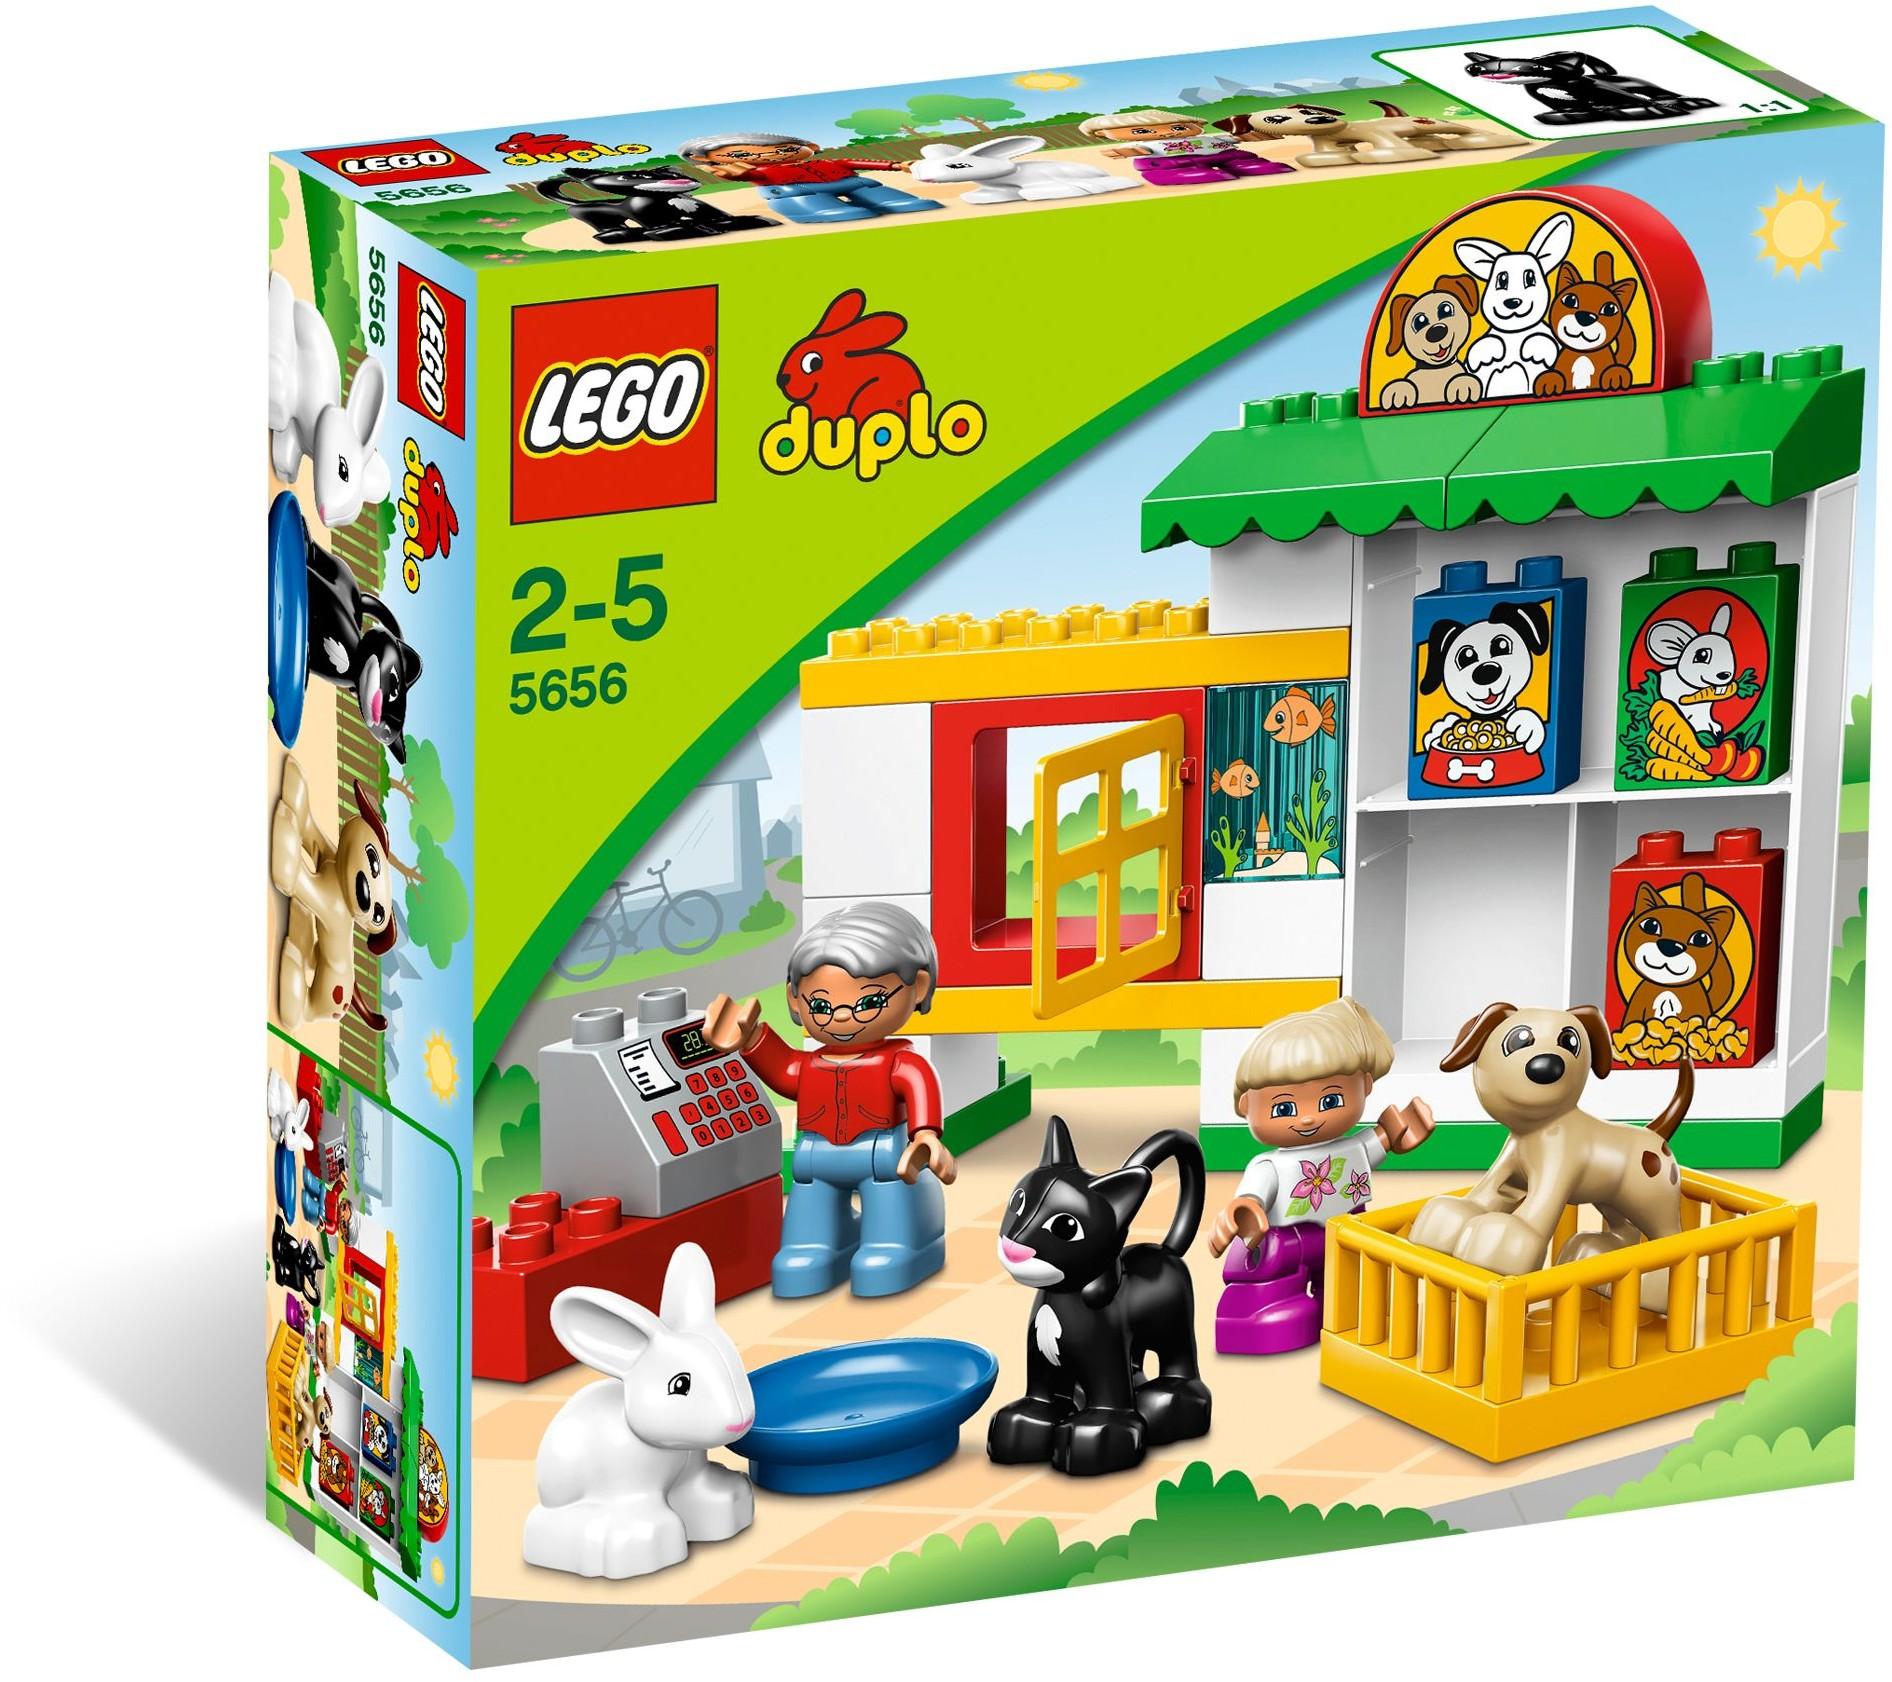 LEGO Duplo 5656 Zverimex